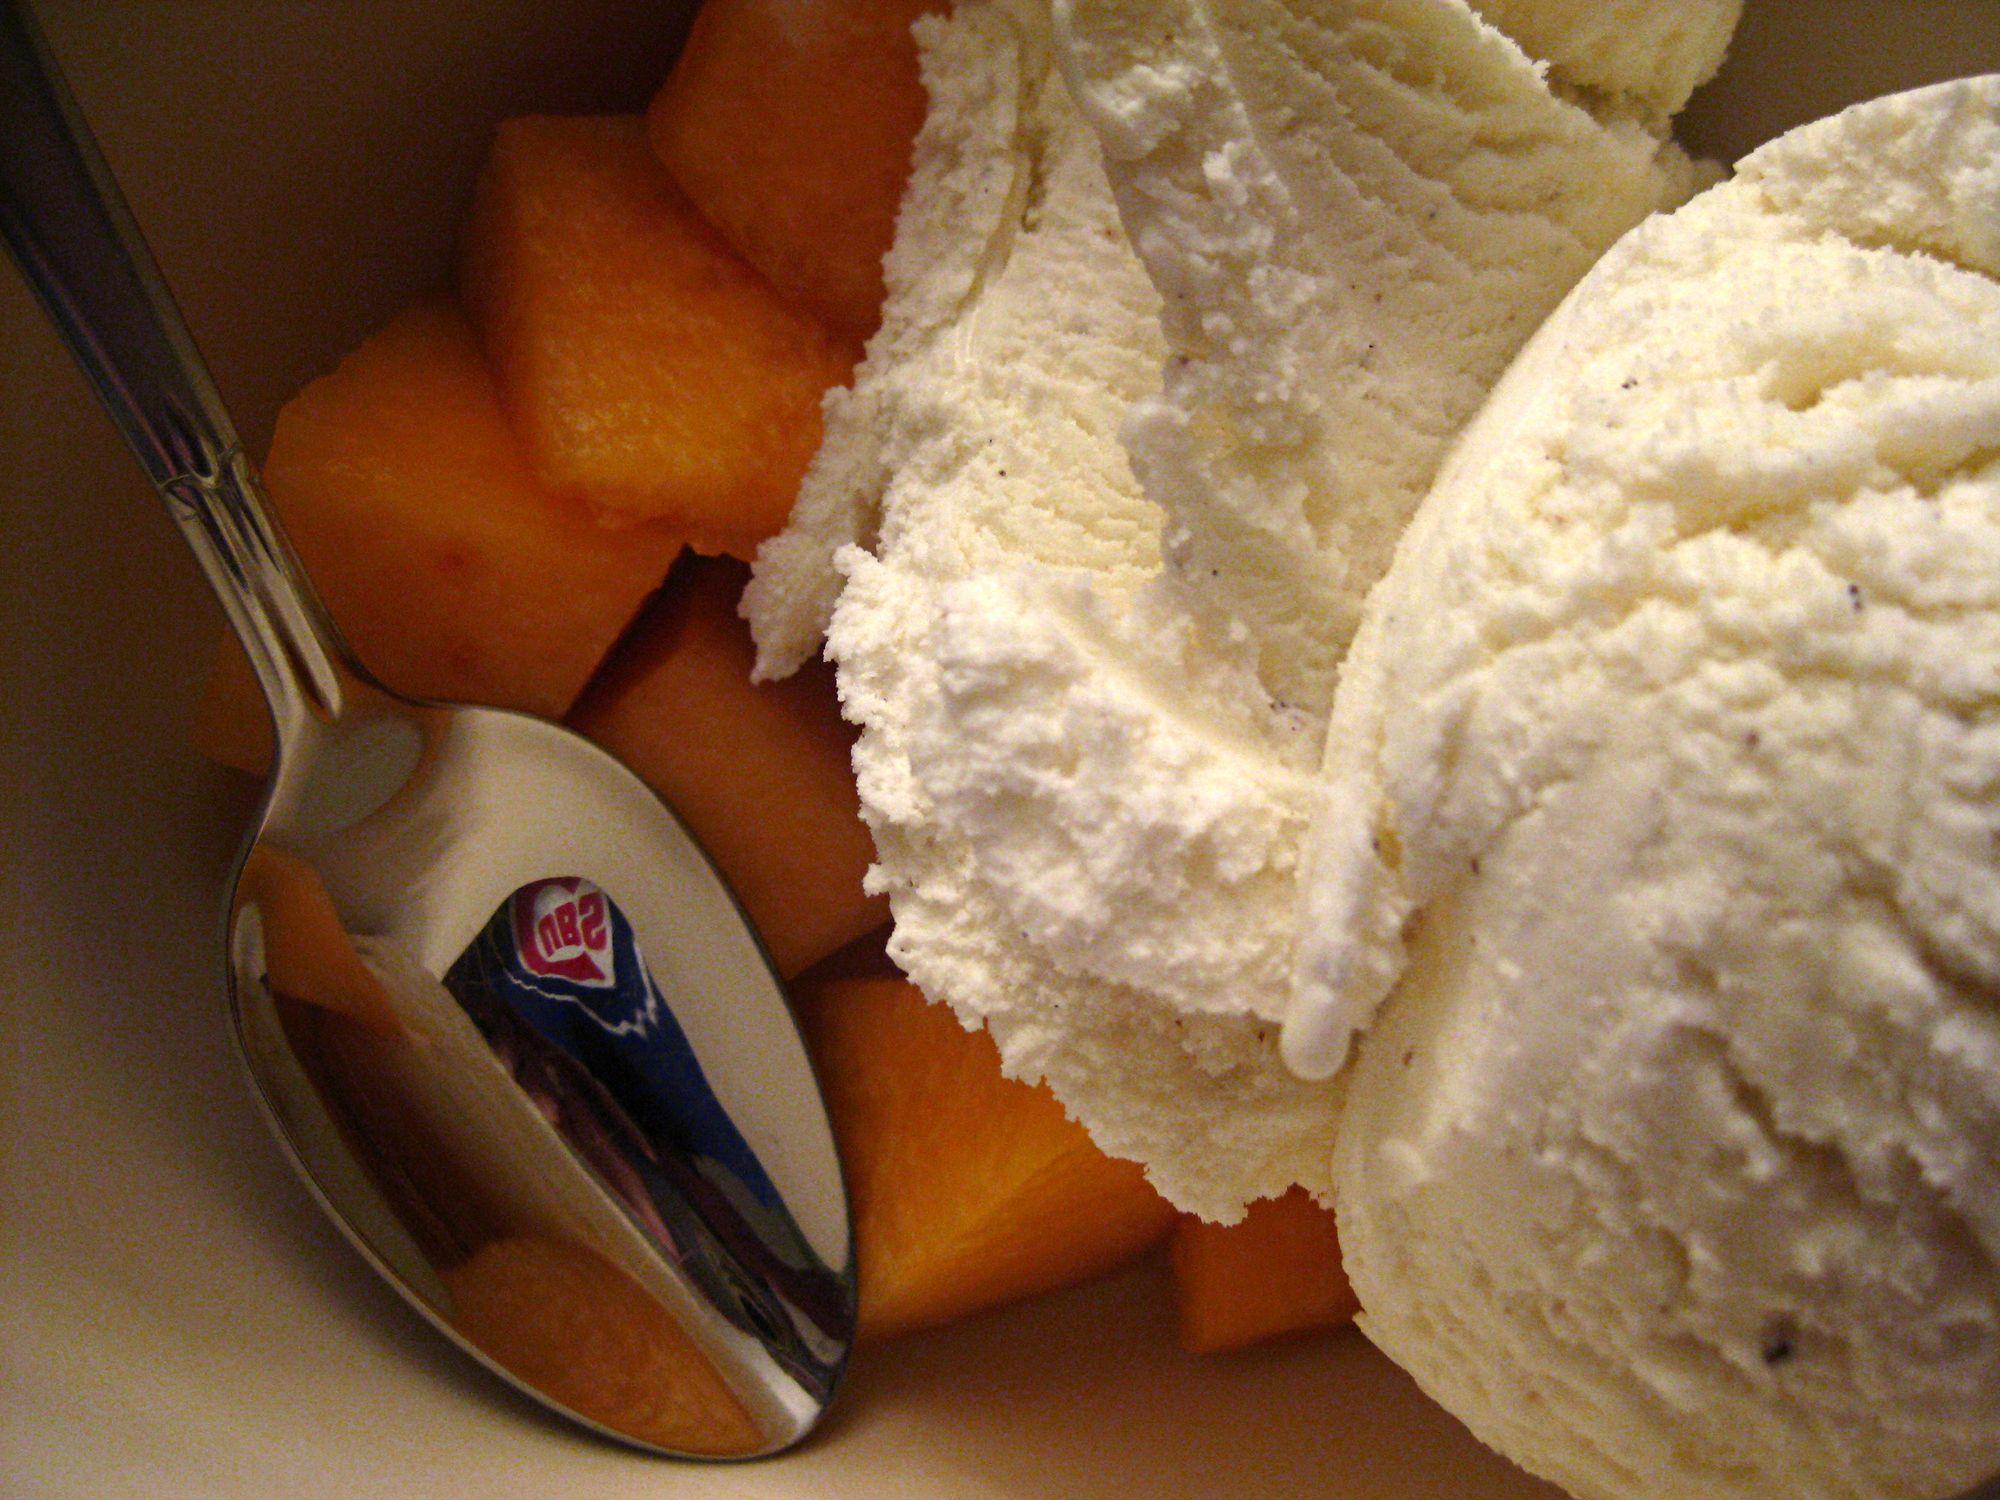 Cantaloupe + Ice Cream + Cubs Shirt